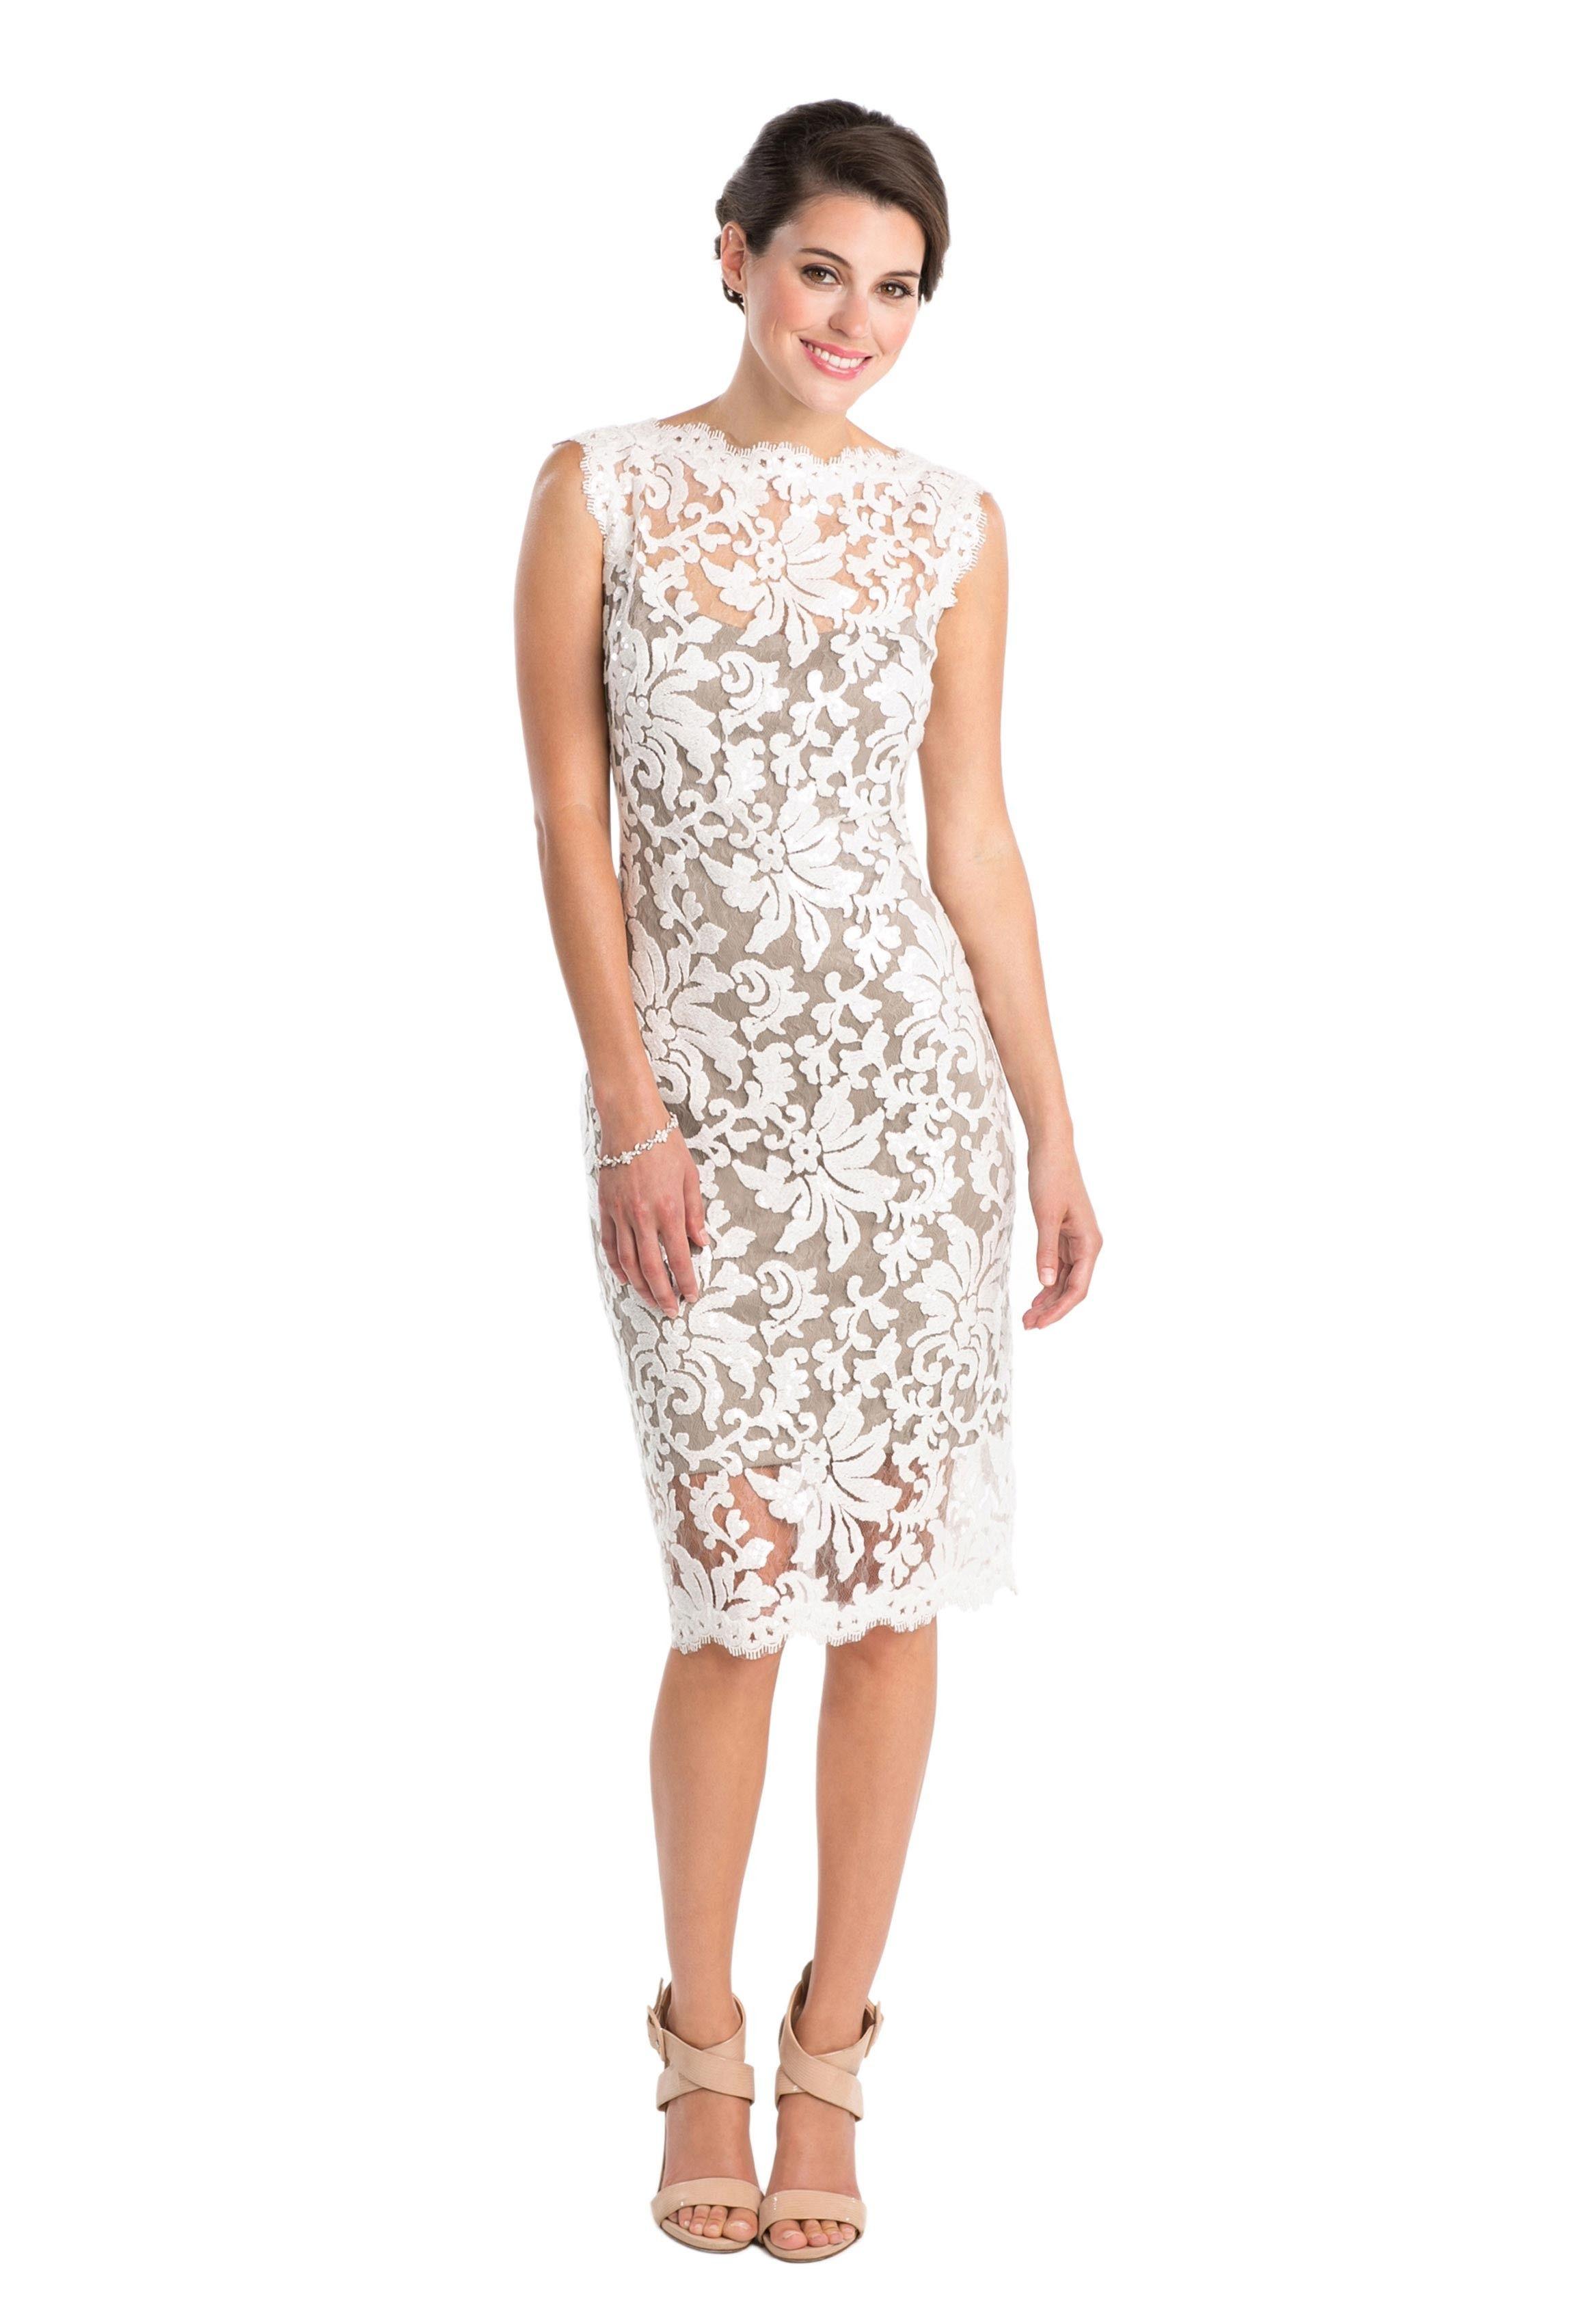 Designer Bridesmaid Dress Rentals Starting At 95 Save 50 85 Off